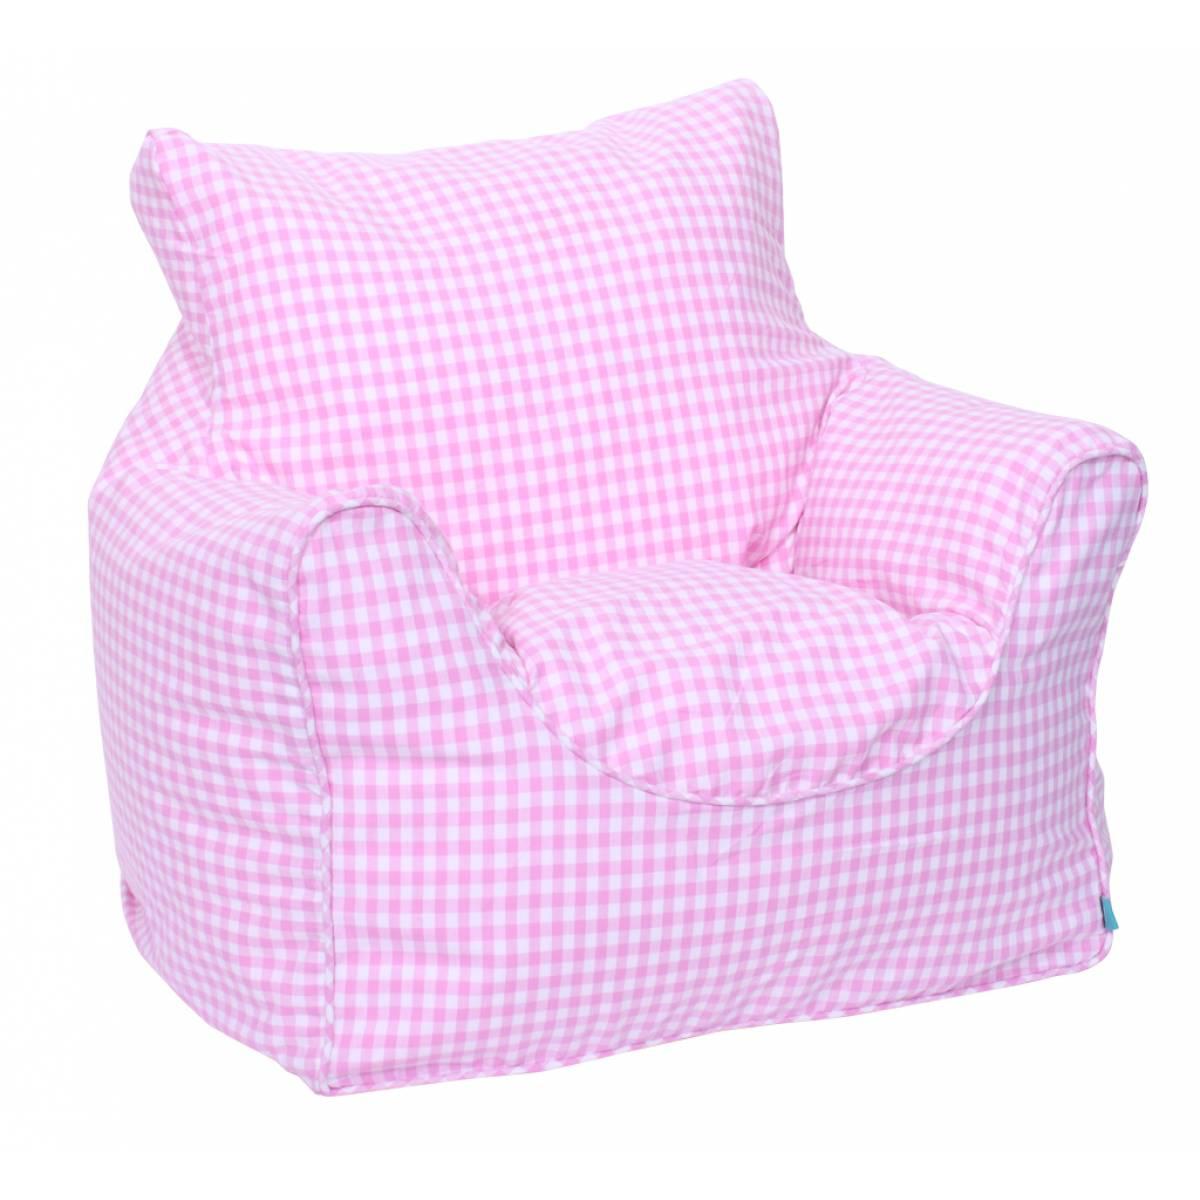 Phenomenal Bean Bag Chair Filled Pink Gingham Uwap Interior Chair Design Uwaporg